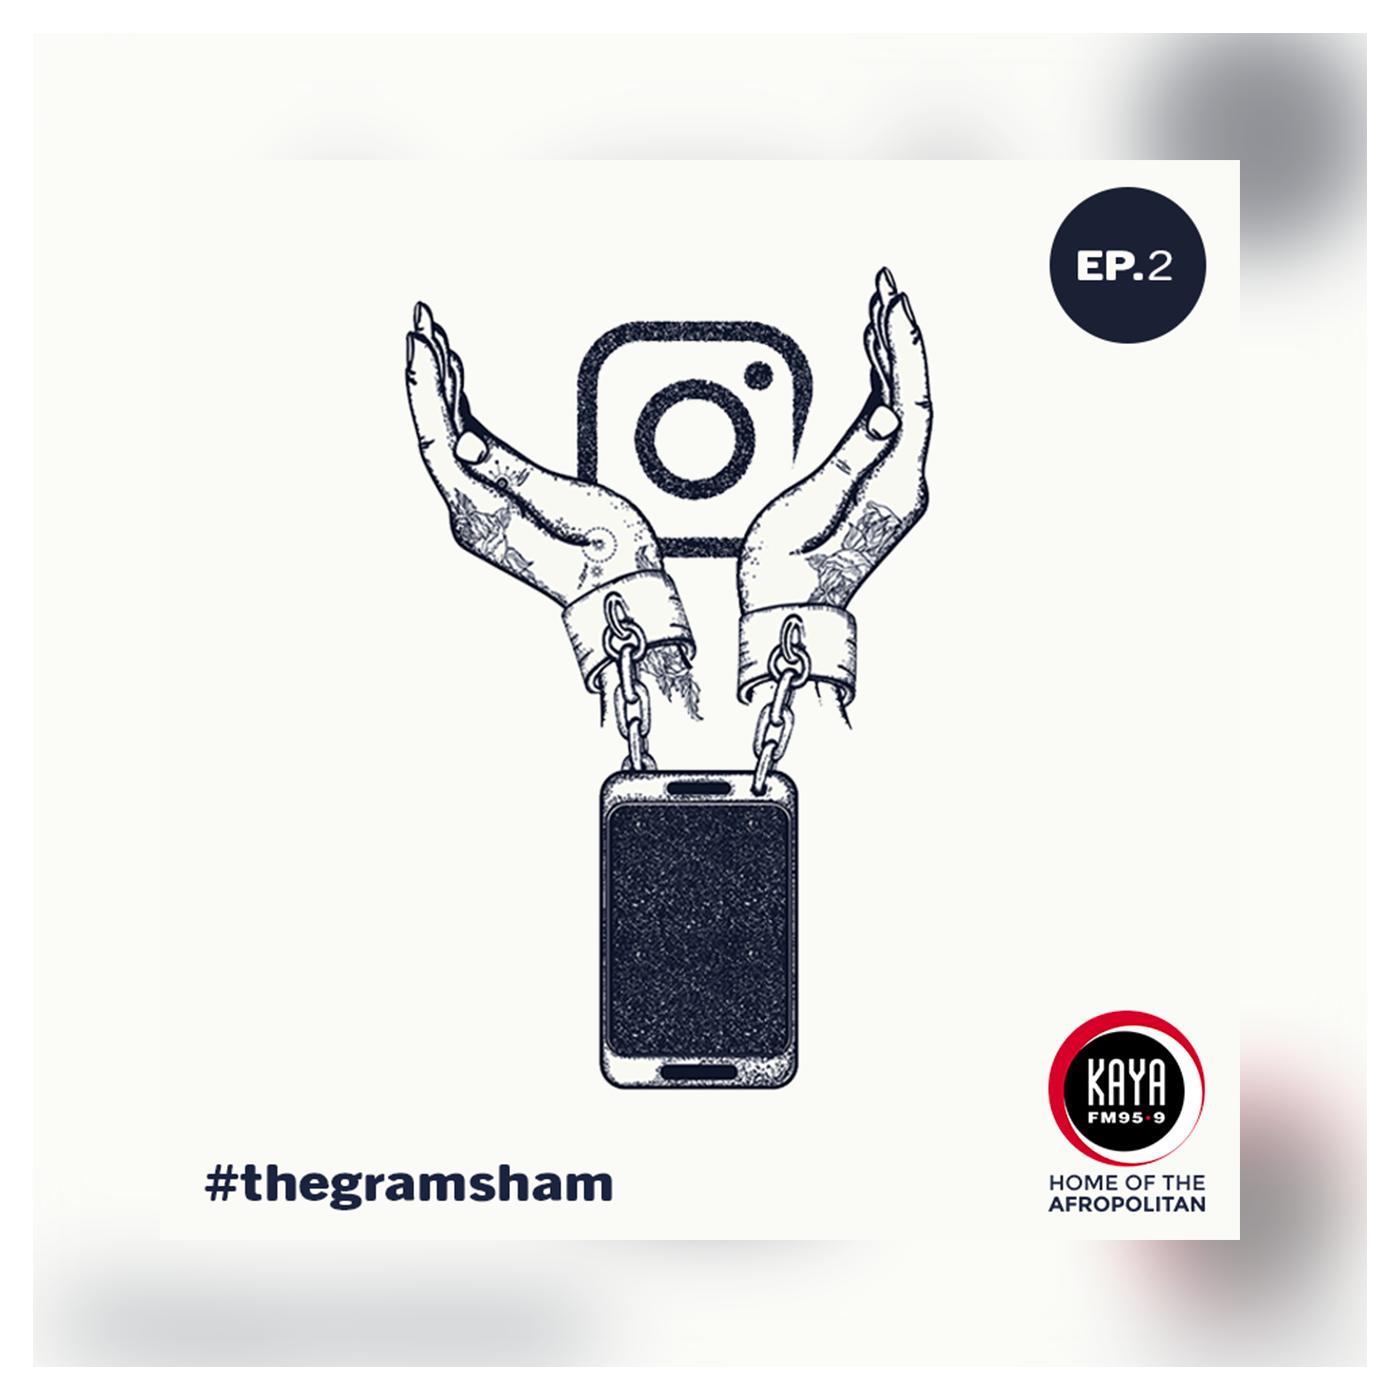 #TheGramSham with Khaya Dlanga